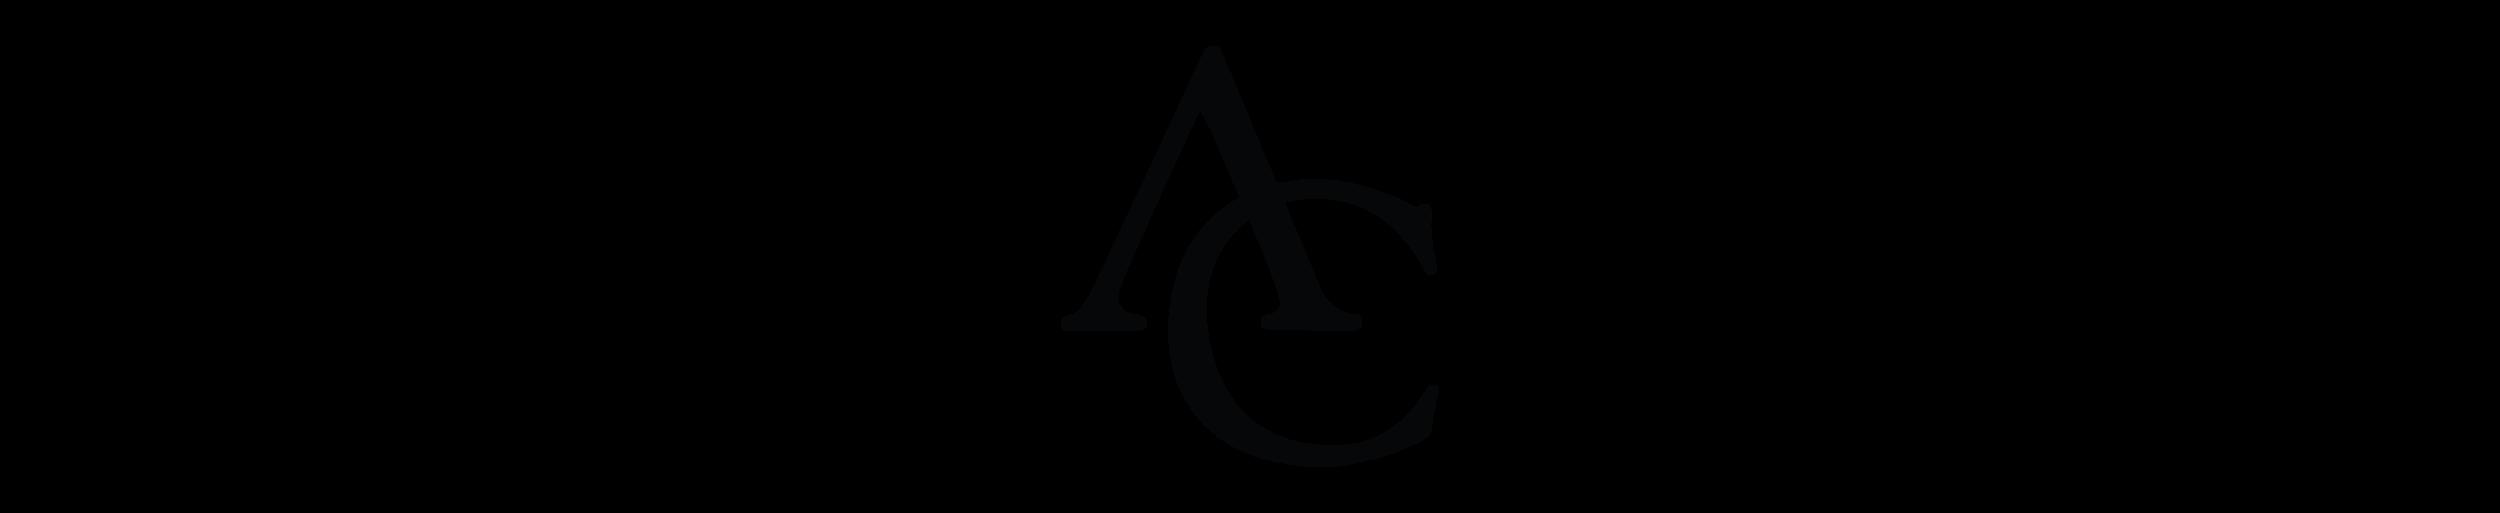 abigail chui footer logo